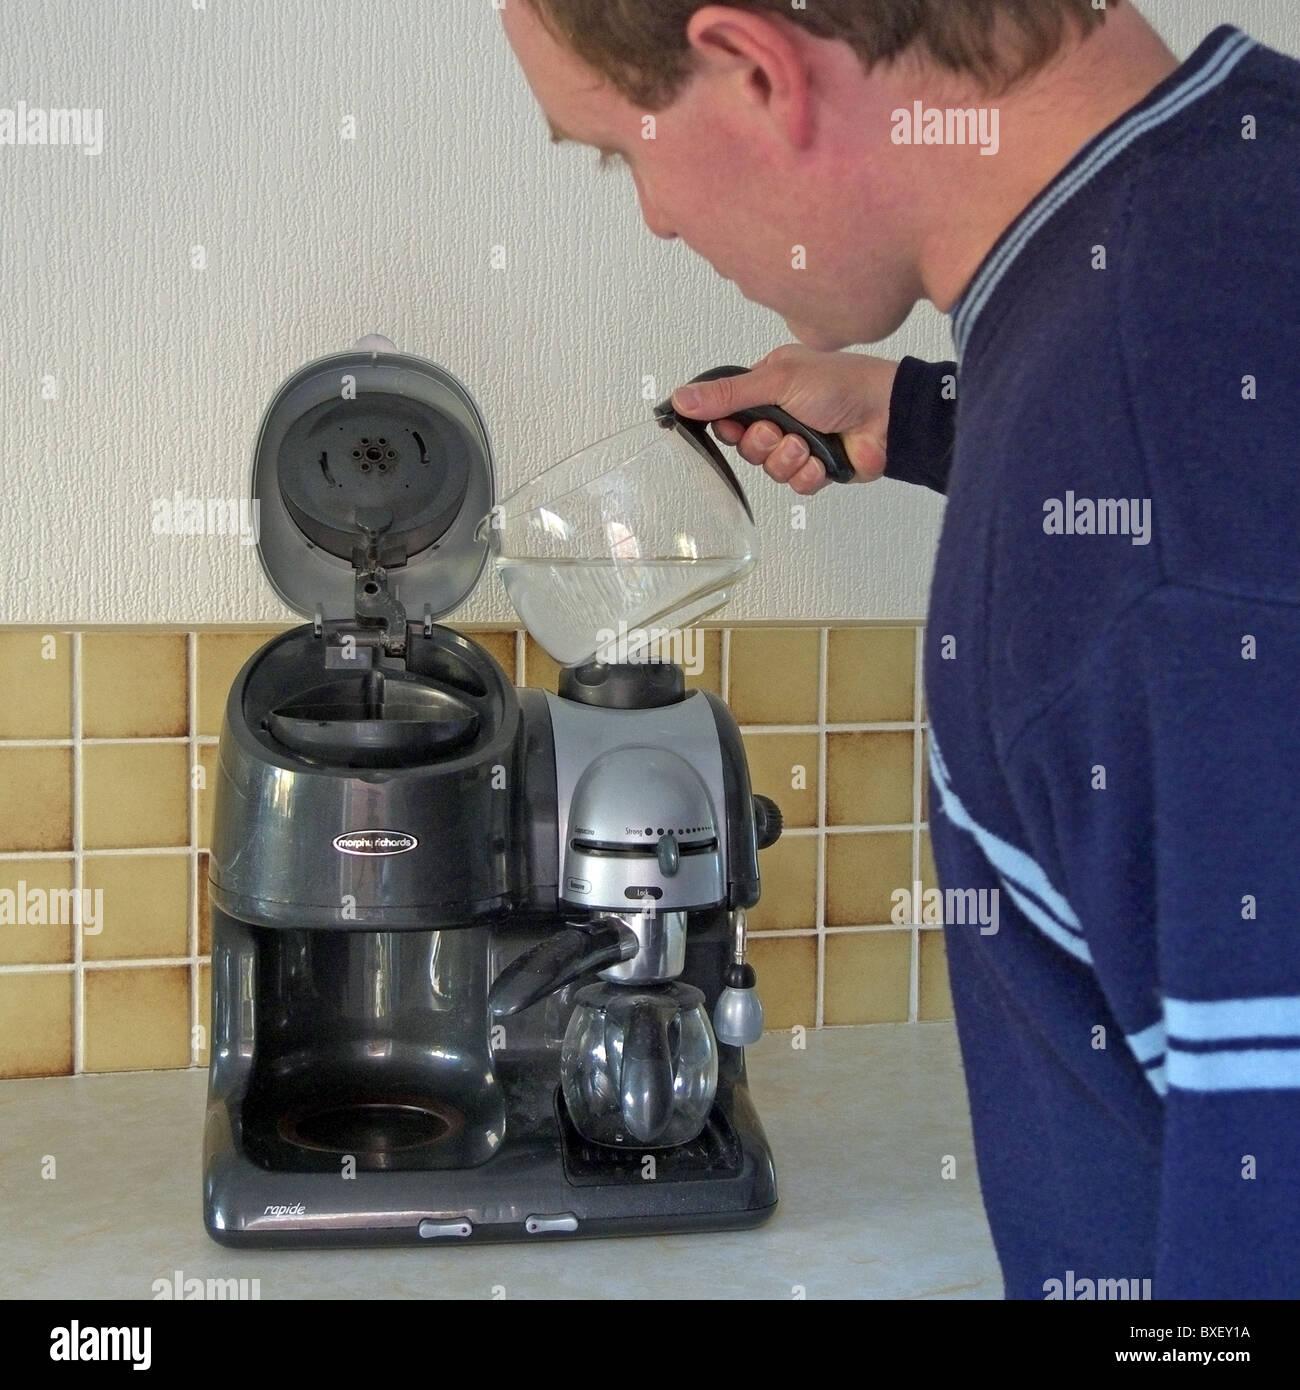 Morphy Richards Ekspres Pour Over: Pour Coffee Stock Photos & Pour Coffee Stock Images